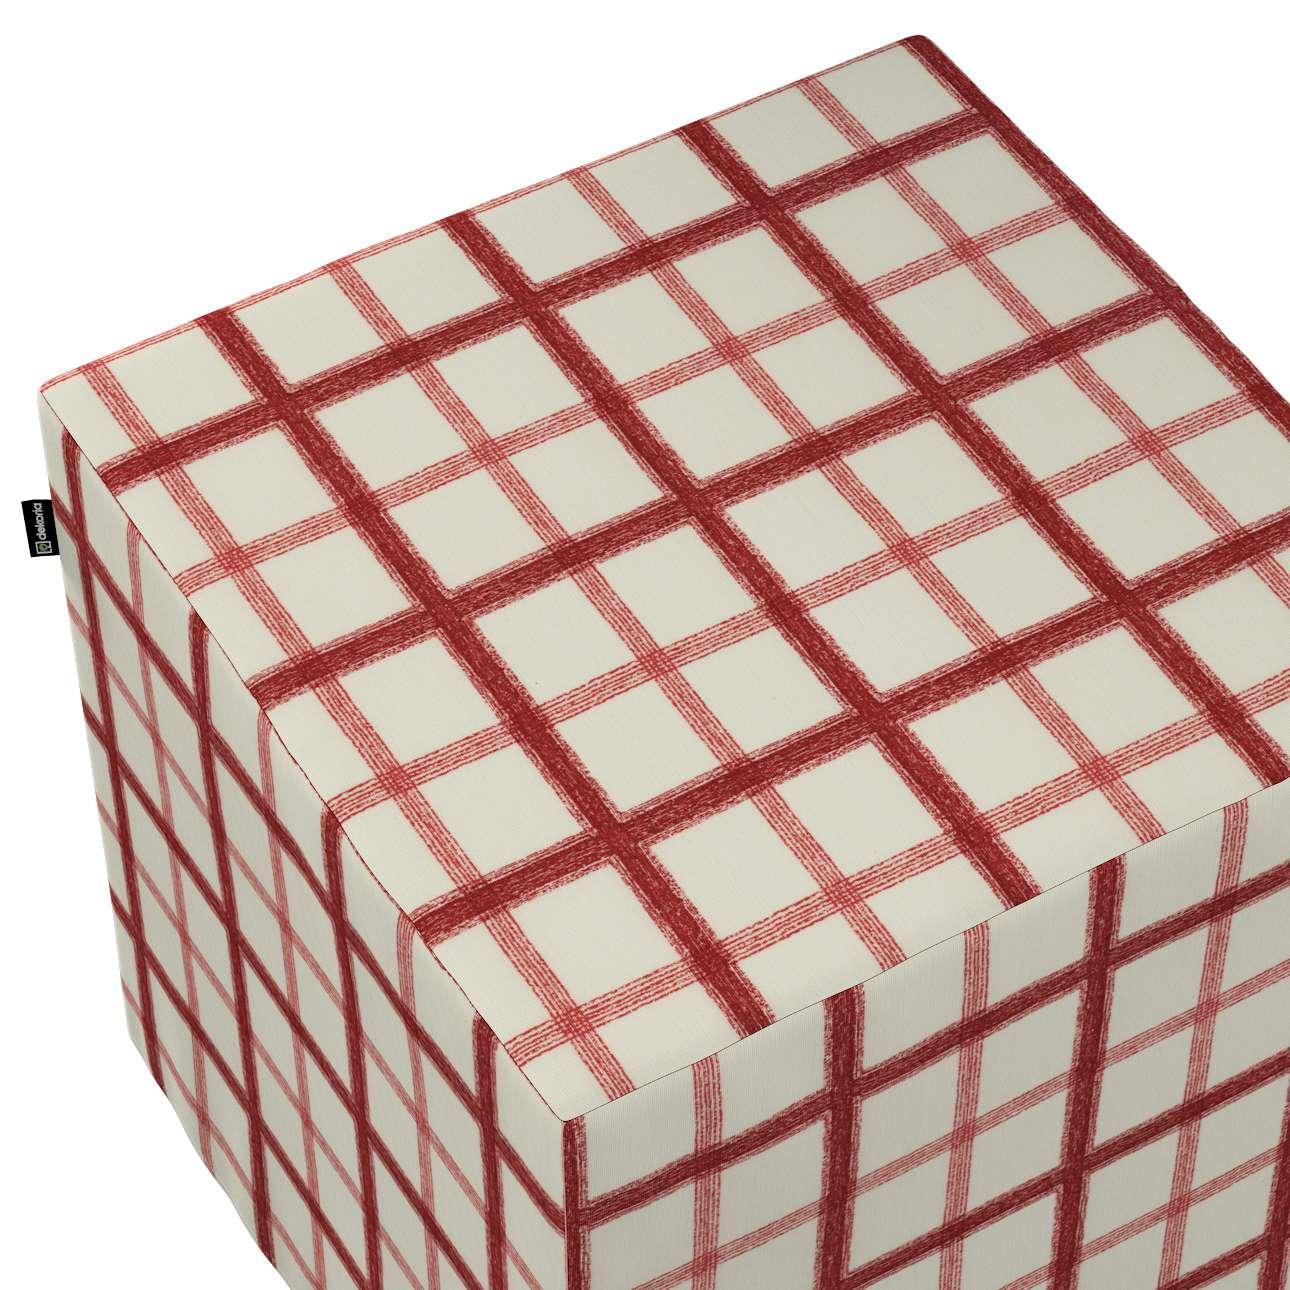 Pufa kostka w kolekcji Avinon, tkanina: 131-15